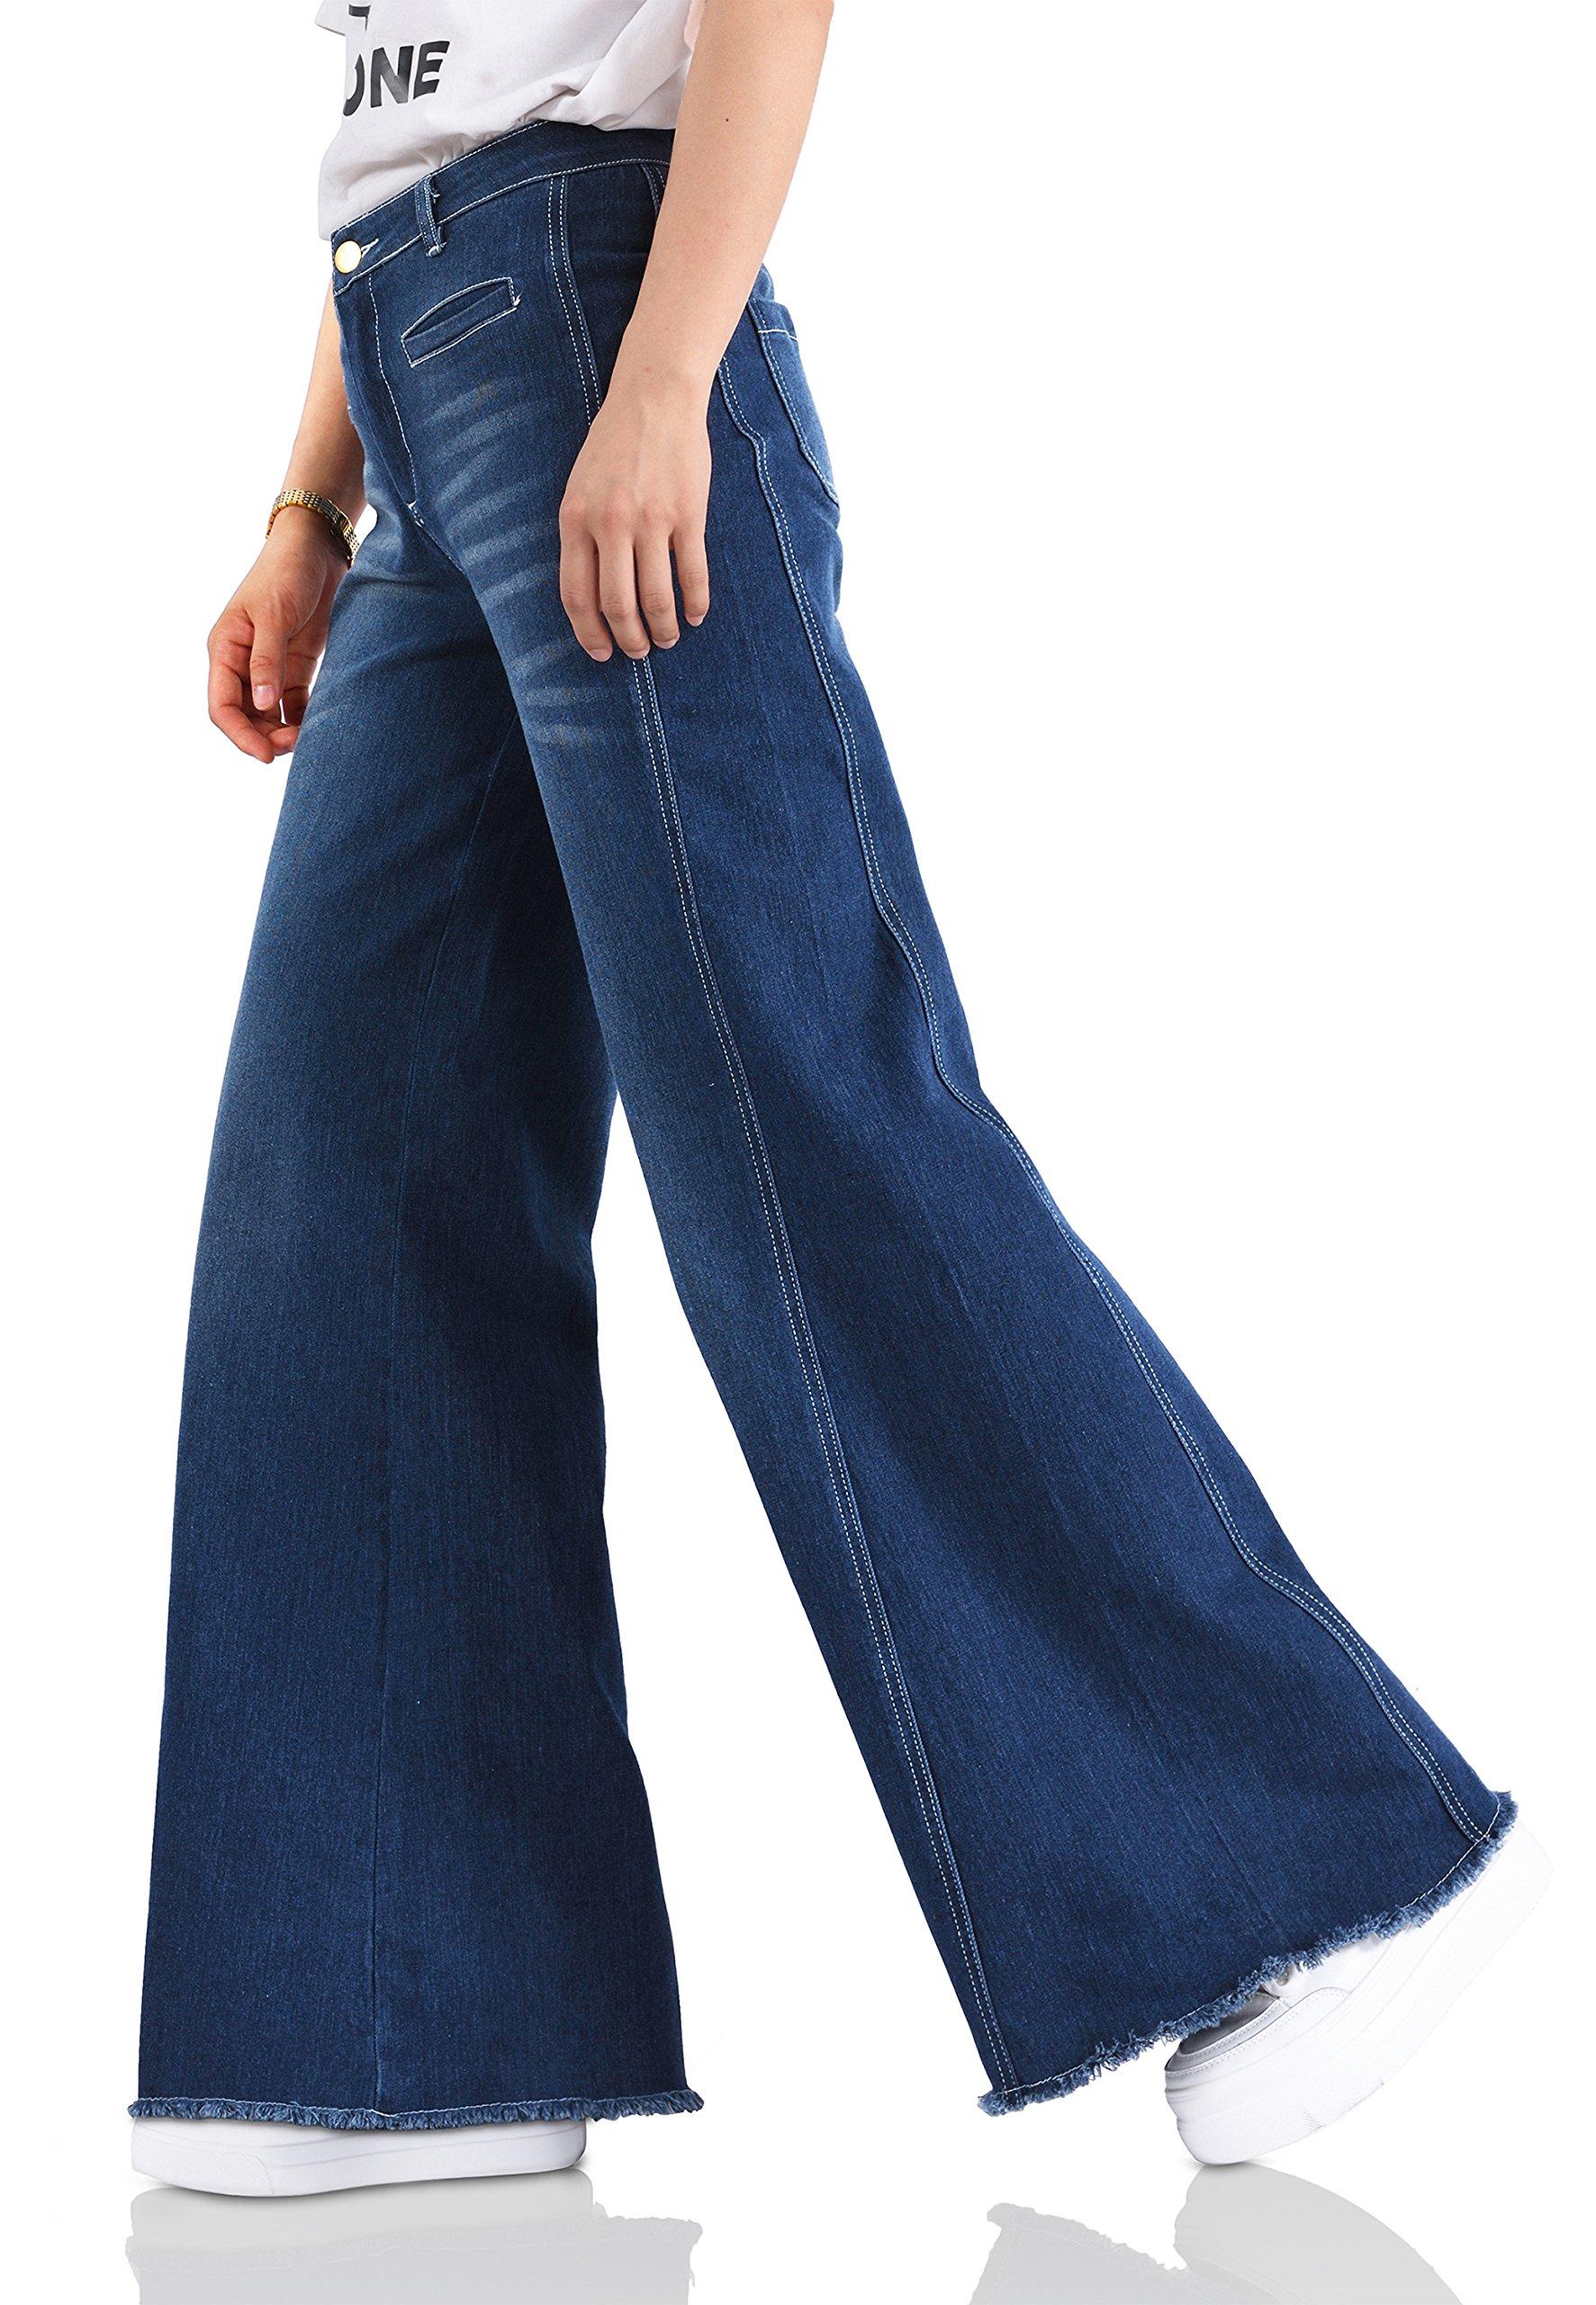 ABCWOO Womens Wide Leg Flared Jeans Stretchy High Waist Bell Bottoms Denim Pants Blue M